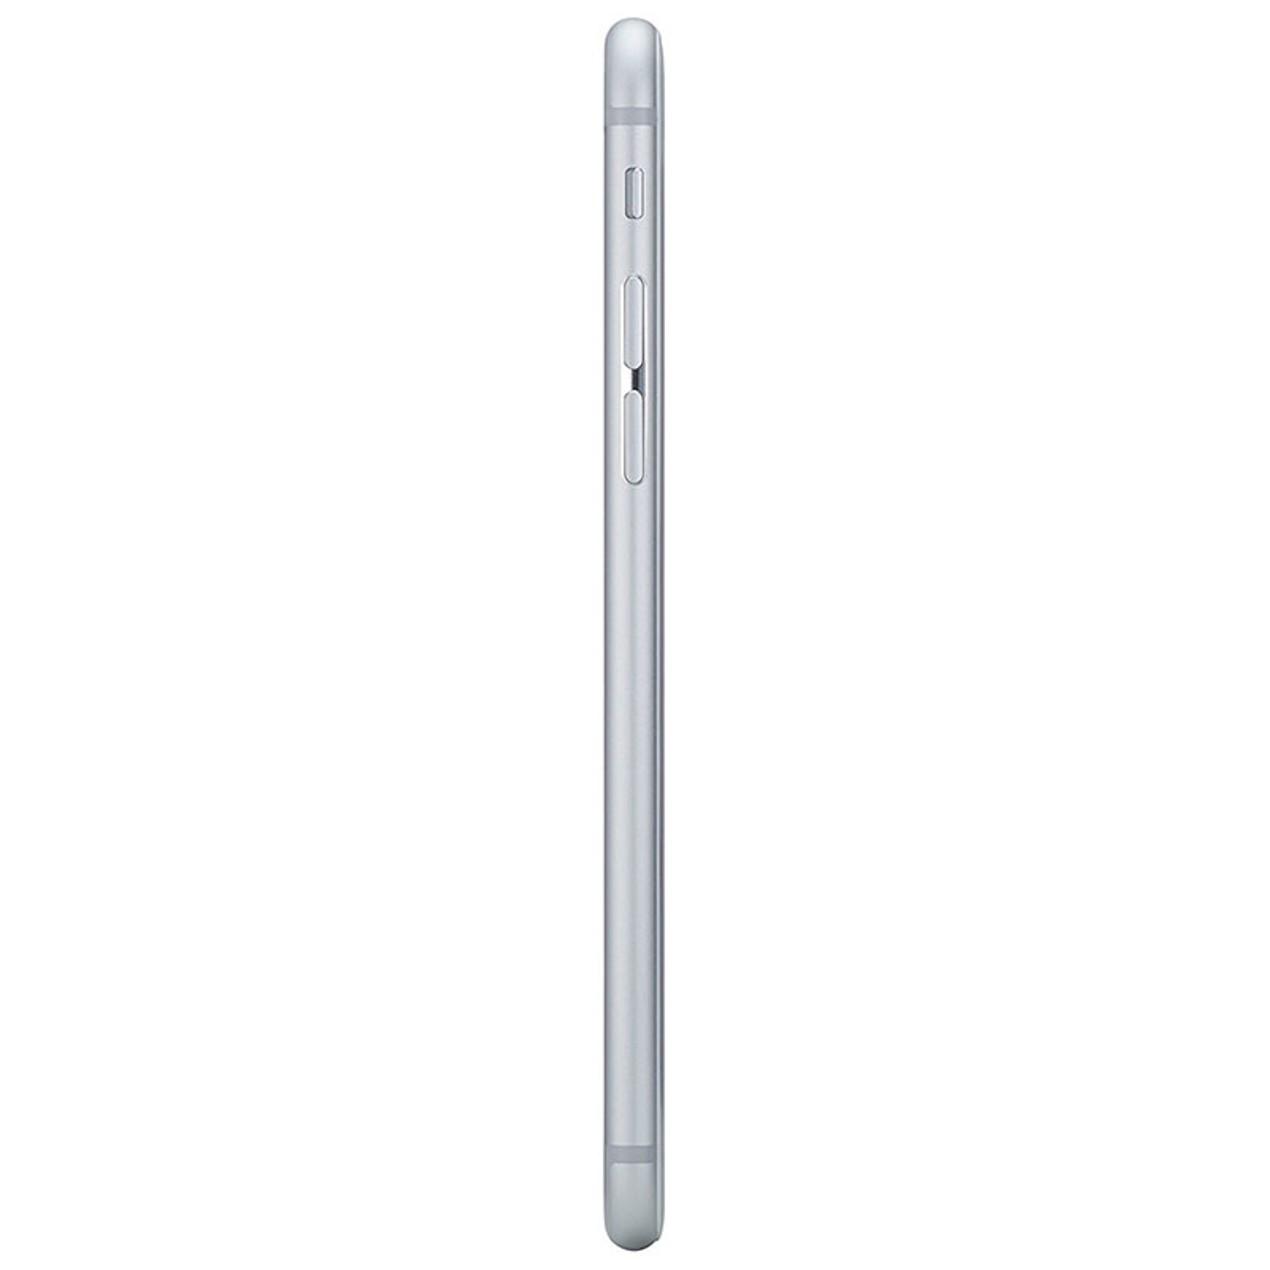 Apple Iphone 6 64gb Gsm Unlocked Black Gold Or Silver Tanga 6s Grey